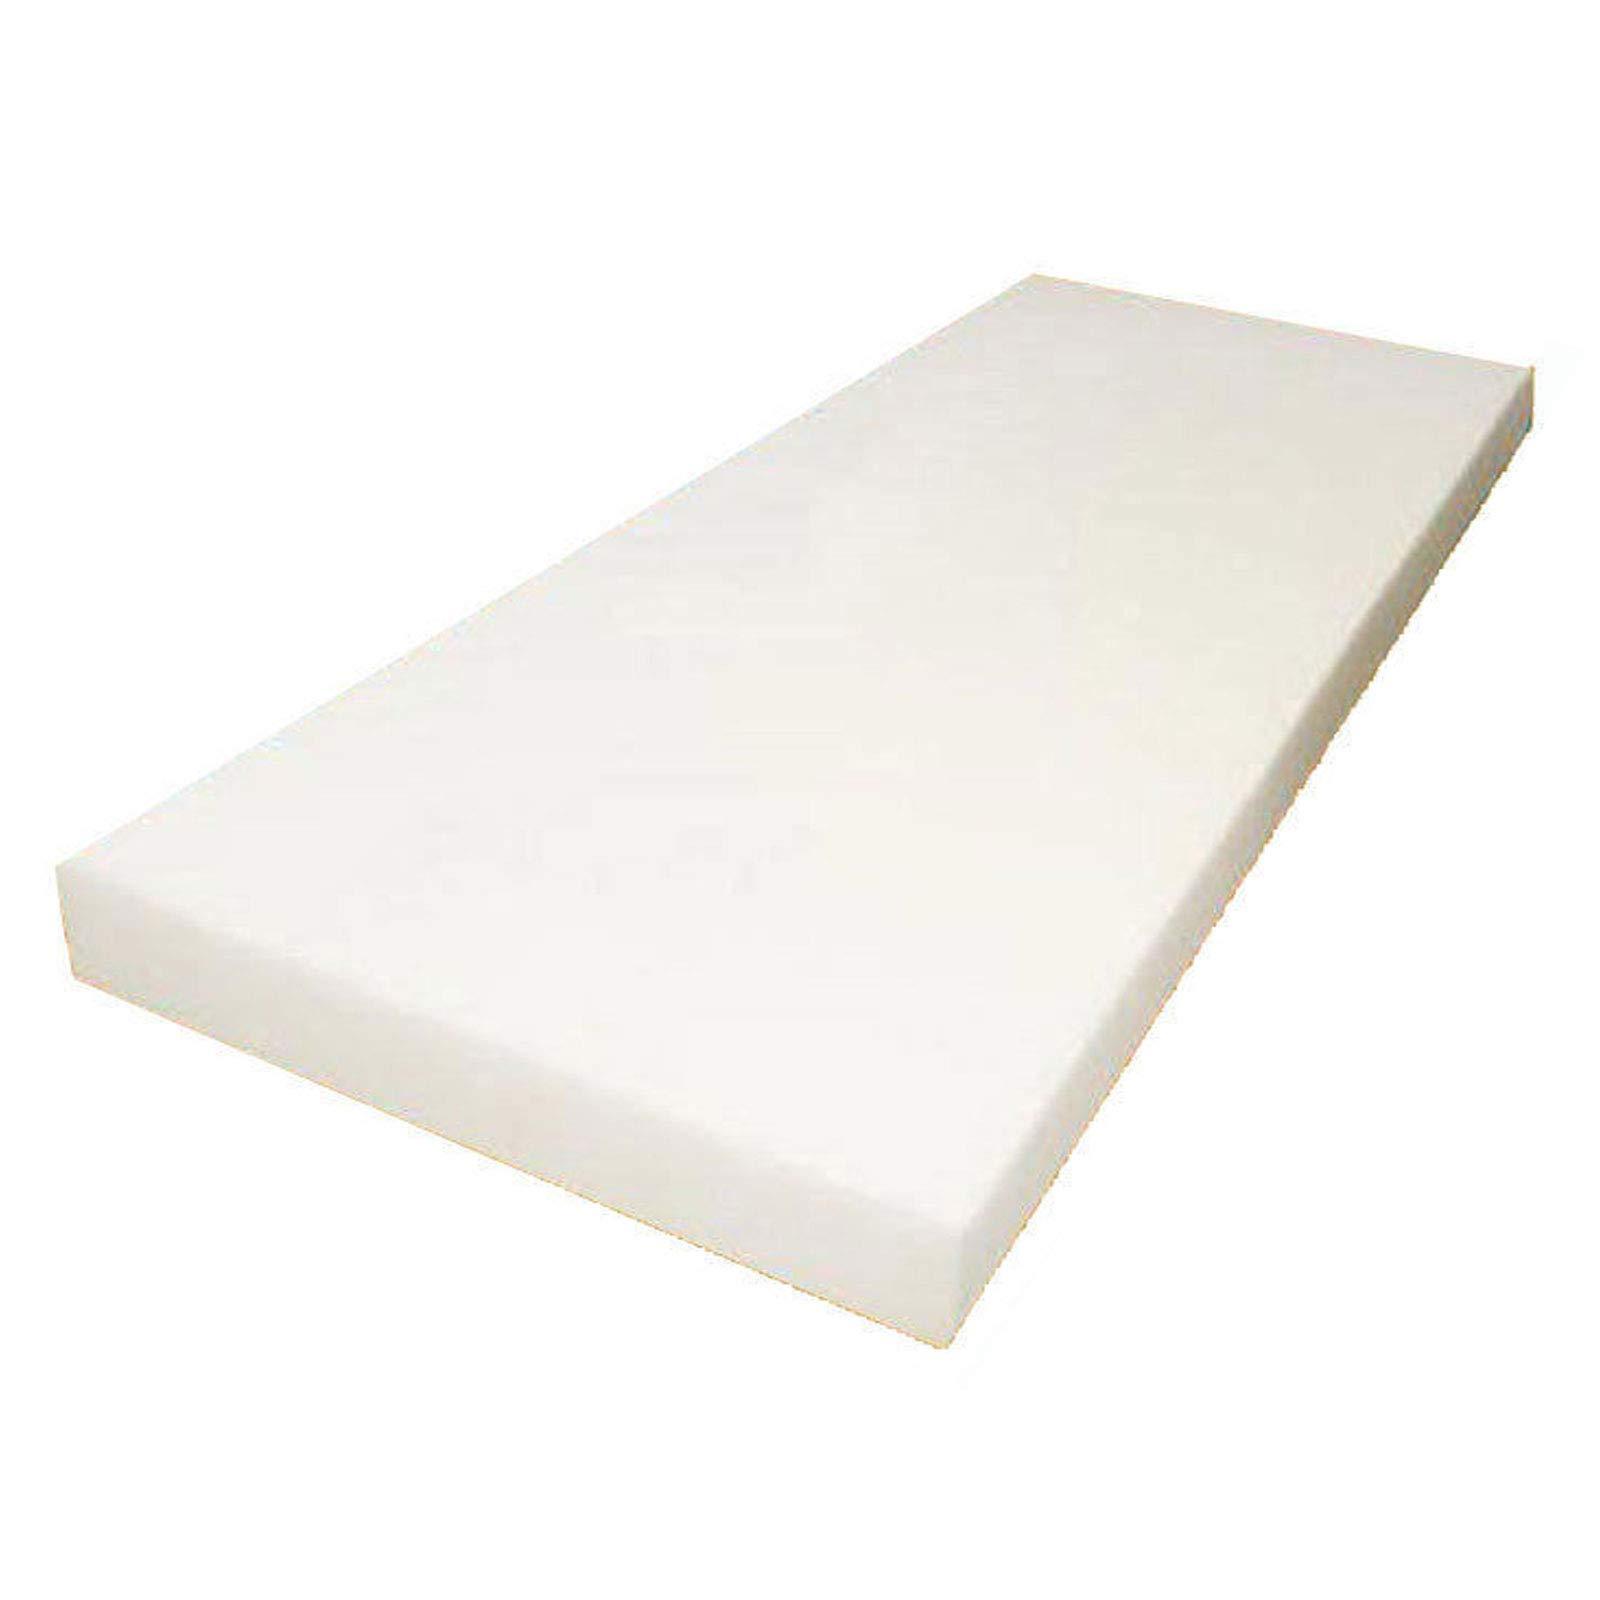 Mybecca High Density Firm Seat Replacement, Upholstery Sheet Foam Padding,6'' H, 24'' W, 72'' L by Mybecca